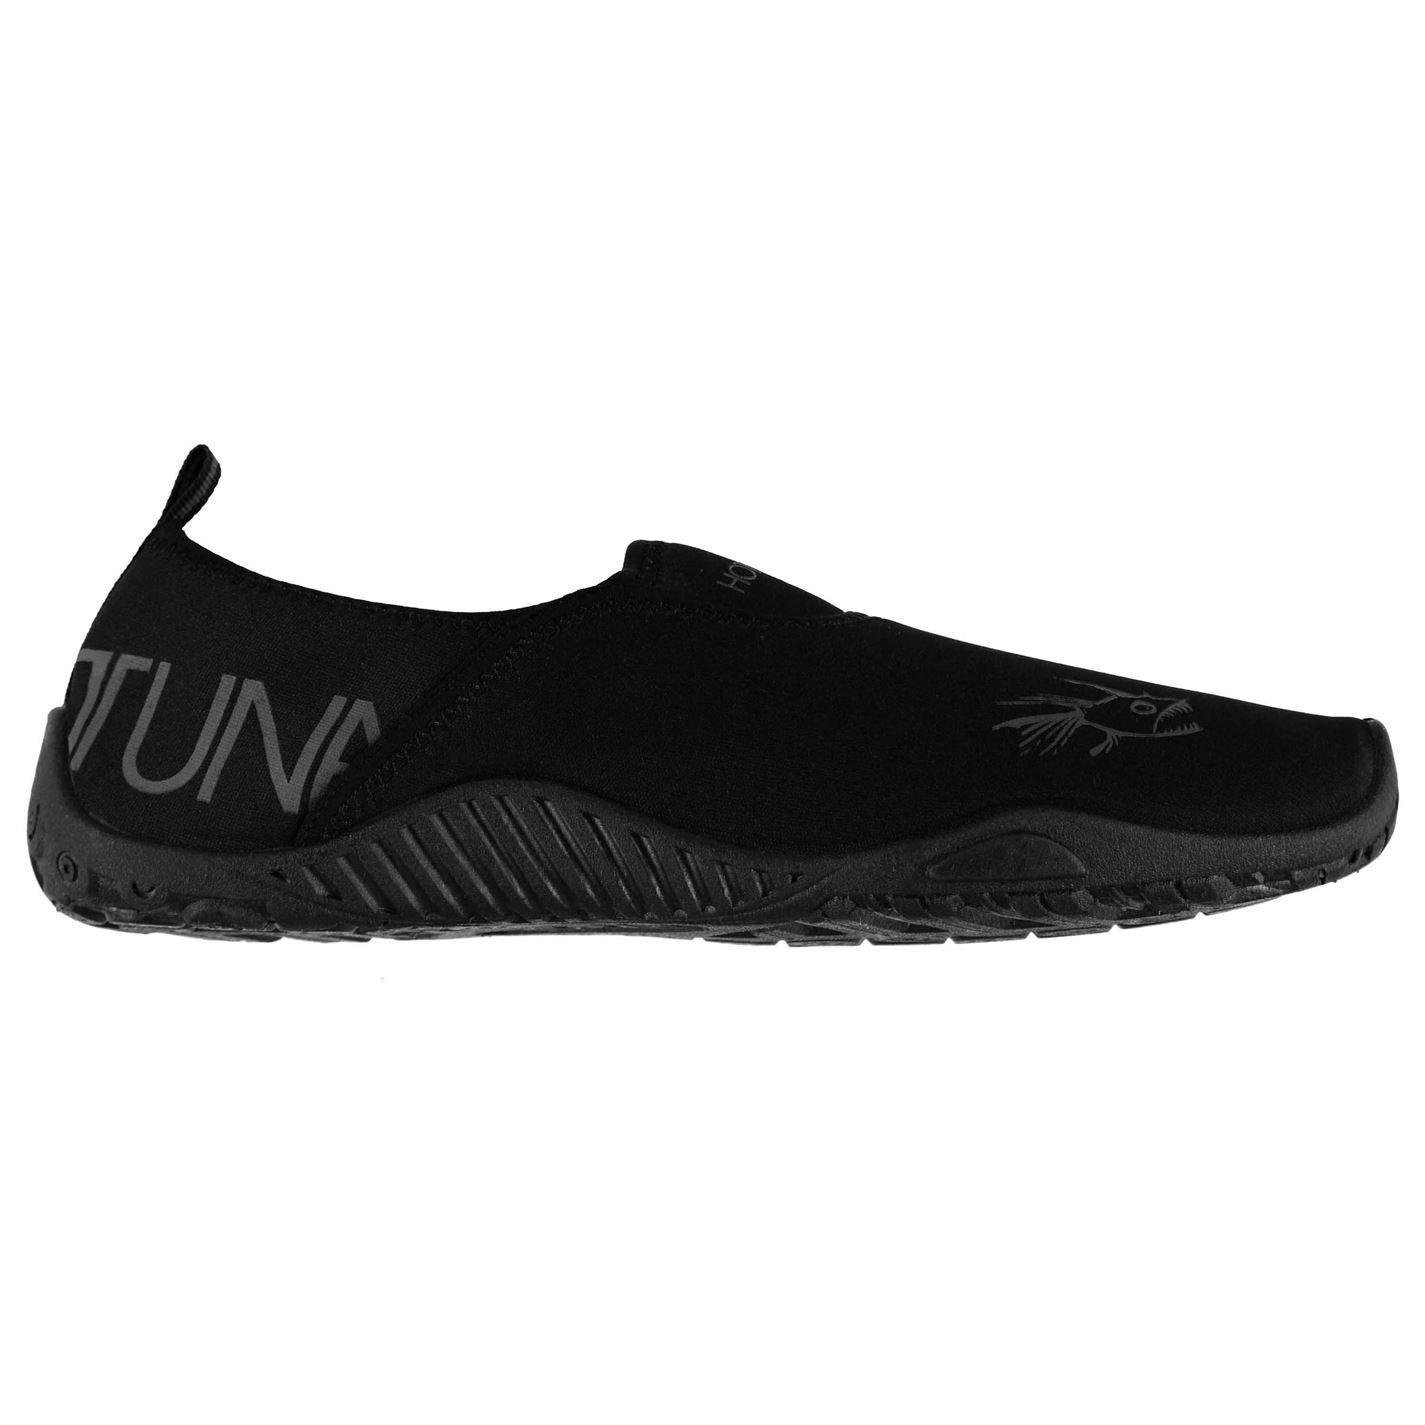 New Mens Hot Tuna Slip On  Splasher Shoes Swim Beach Sandals Size 7-15 SUMMER